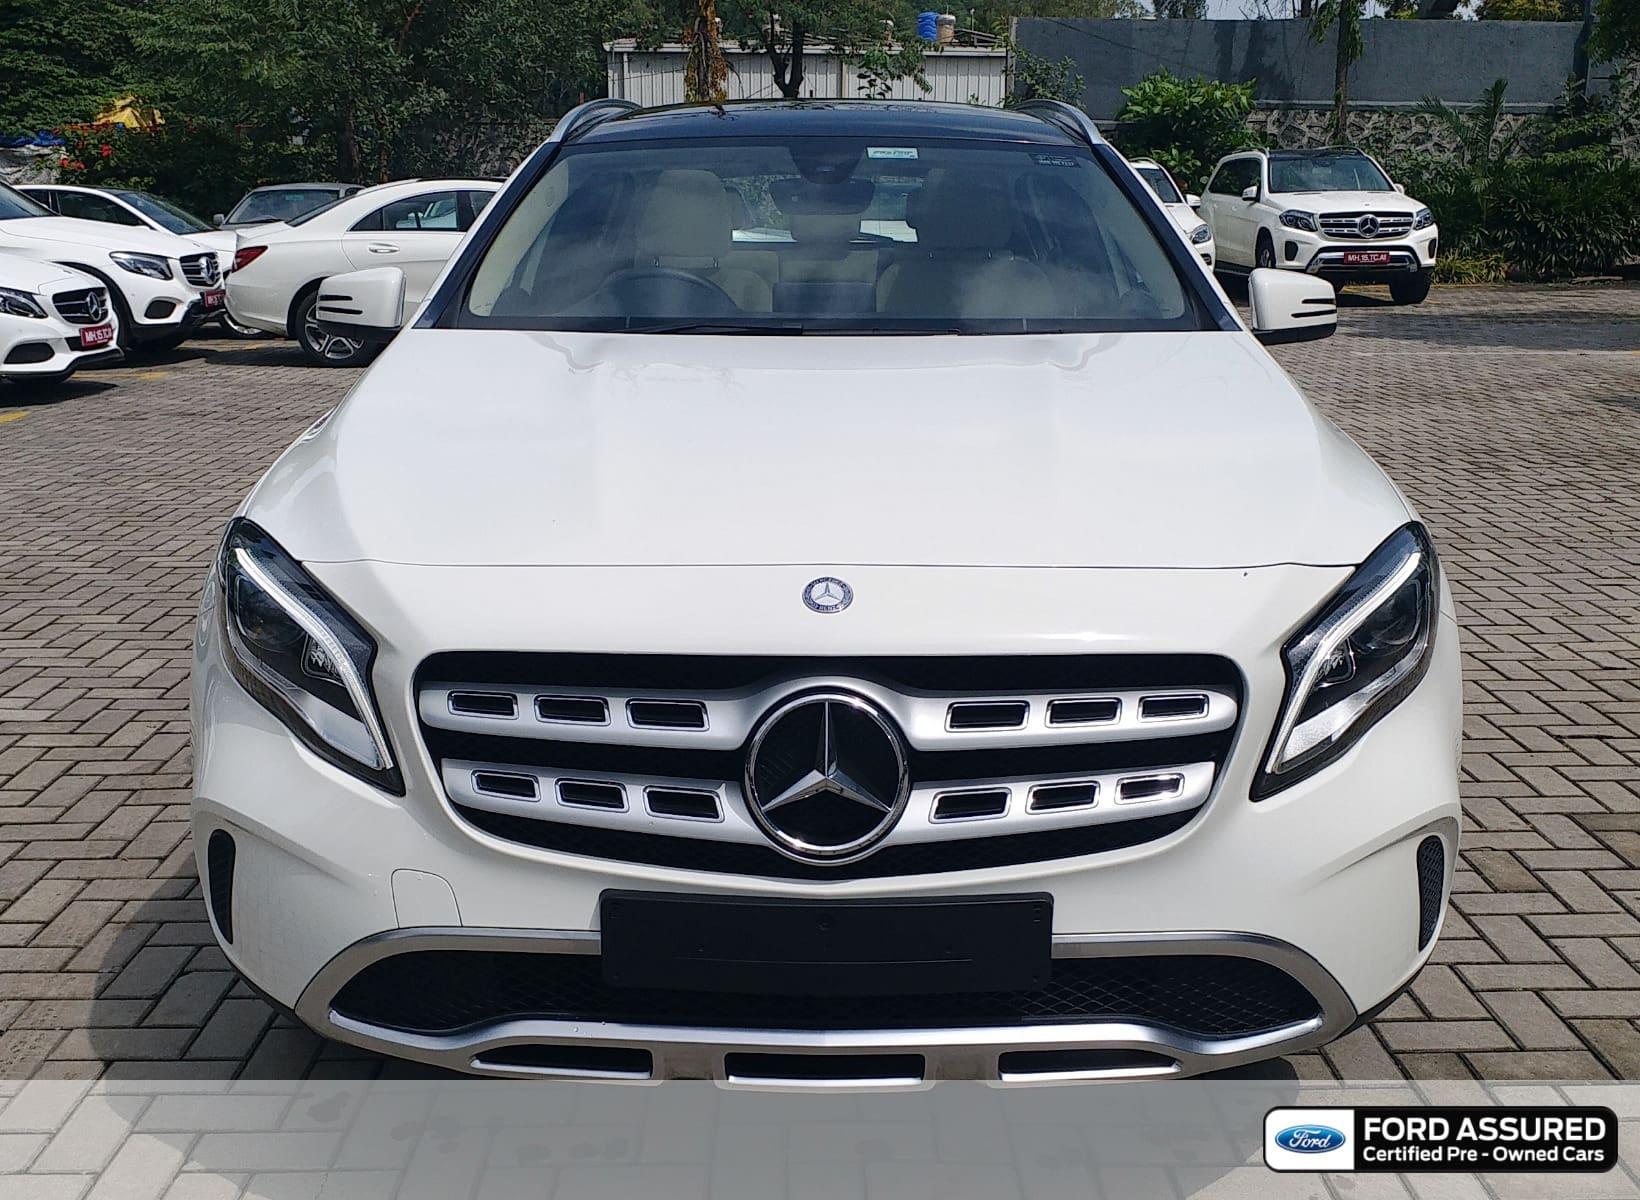 Mercedes-Benz GLA Class 220 d 4MATIC